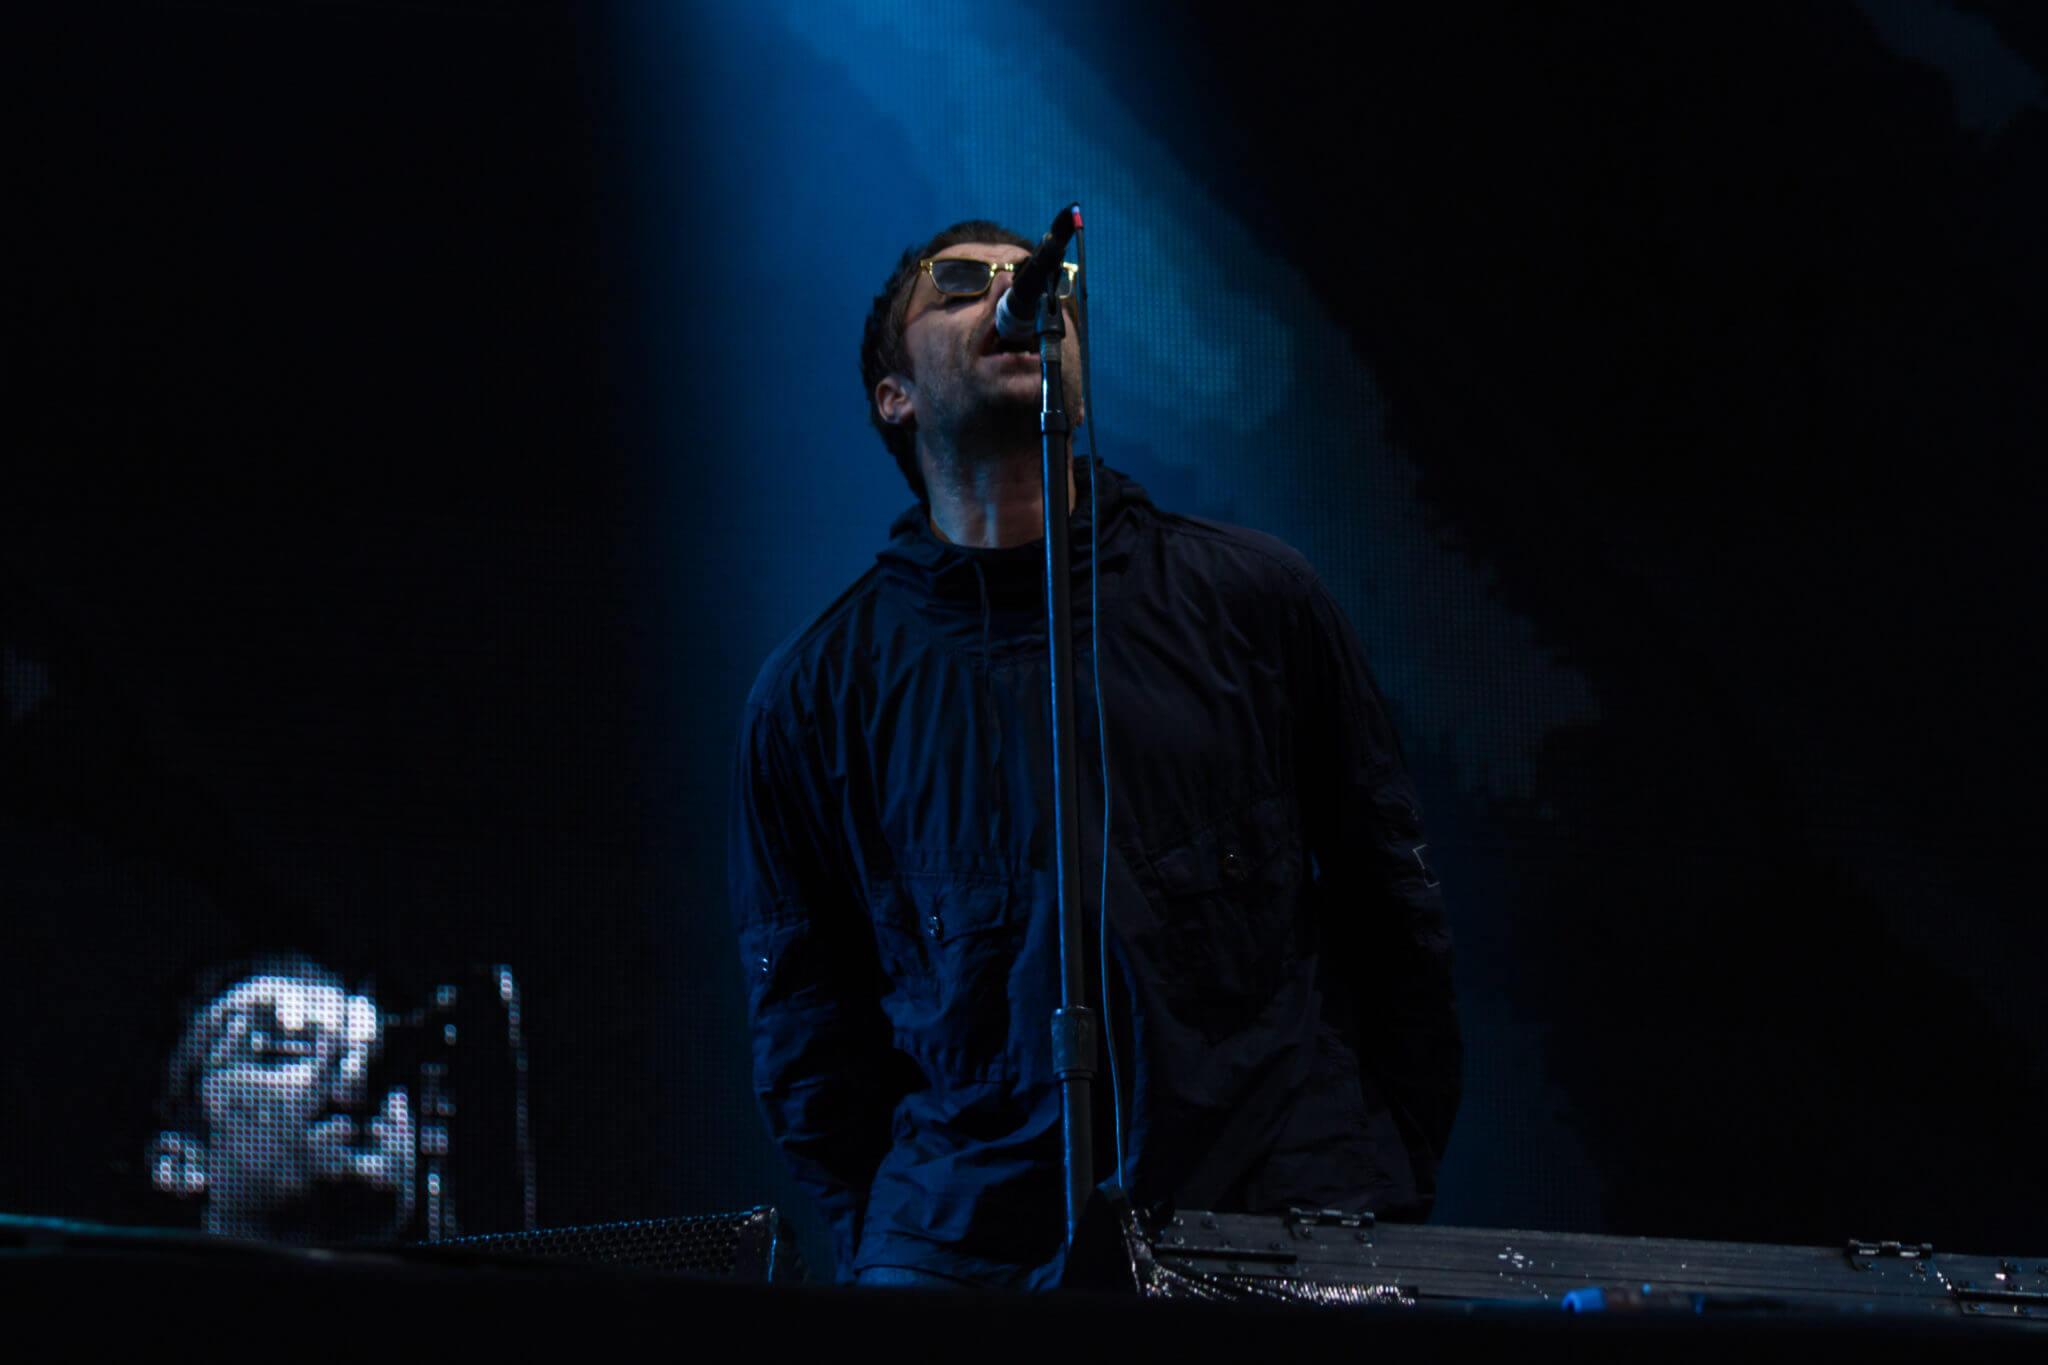 Liam Gallagher @ Lollapalooza Chile 2018. Fotografía: Lukas Cruzat para mor.bo